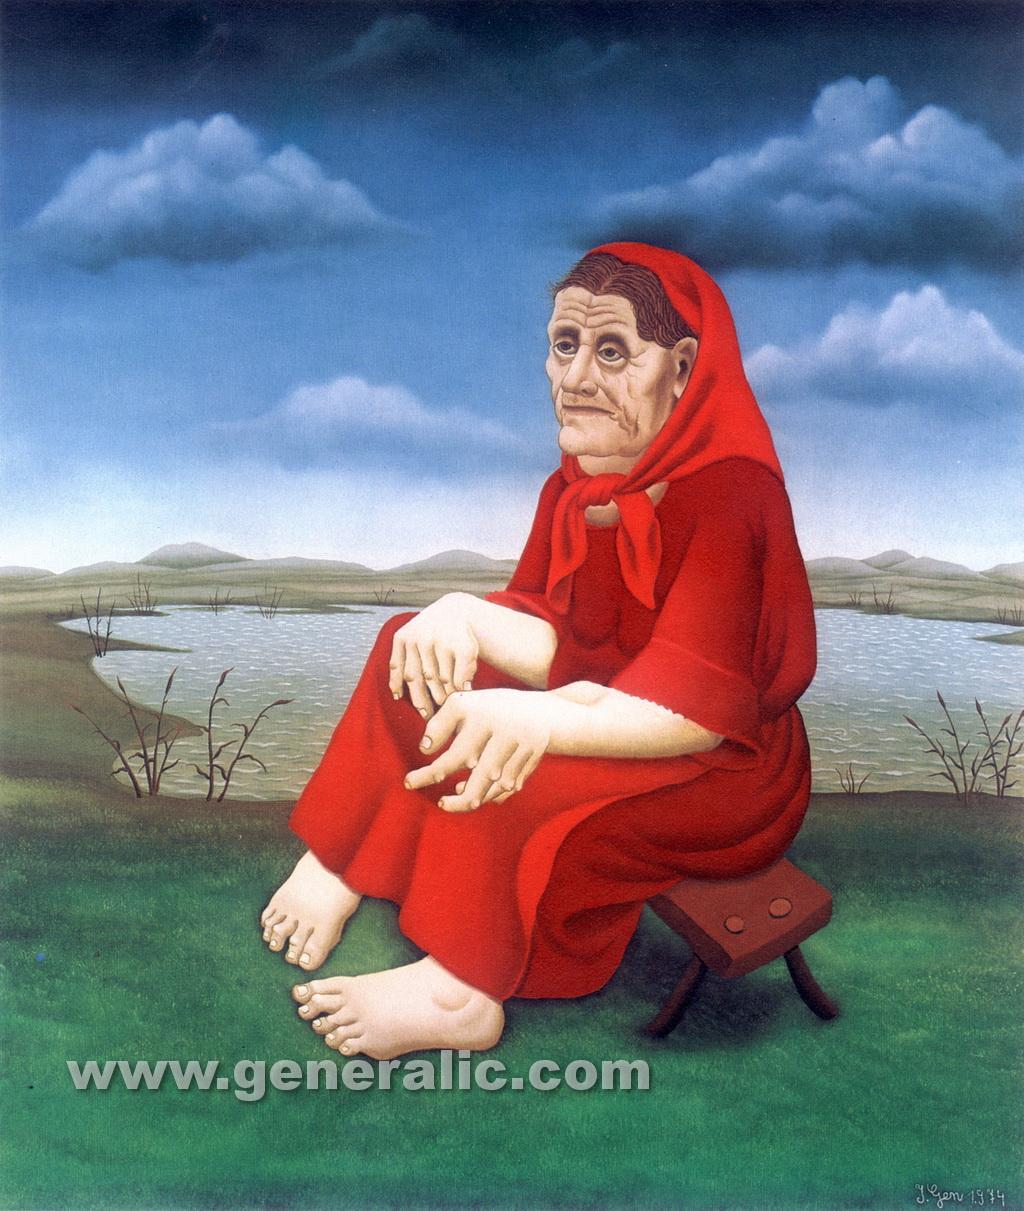 Ivan Generalic, 1974, Old Gipsy woman, oil on glass, 120x100 cm